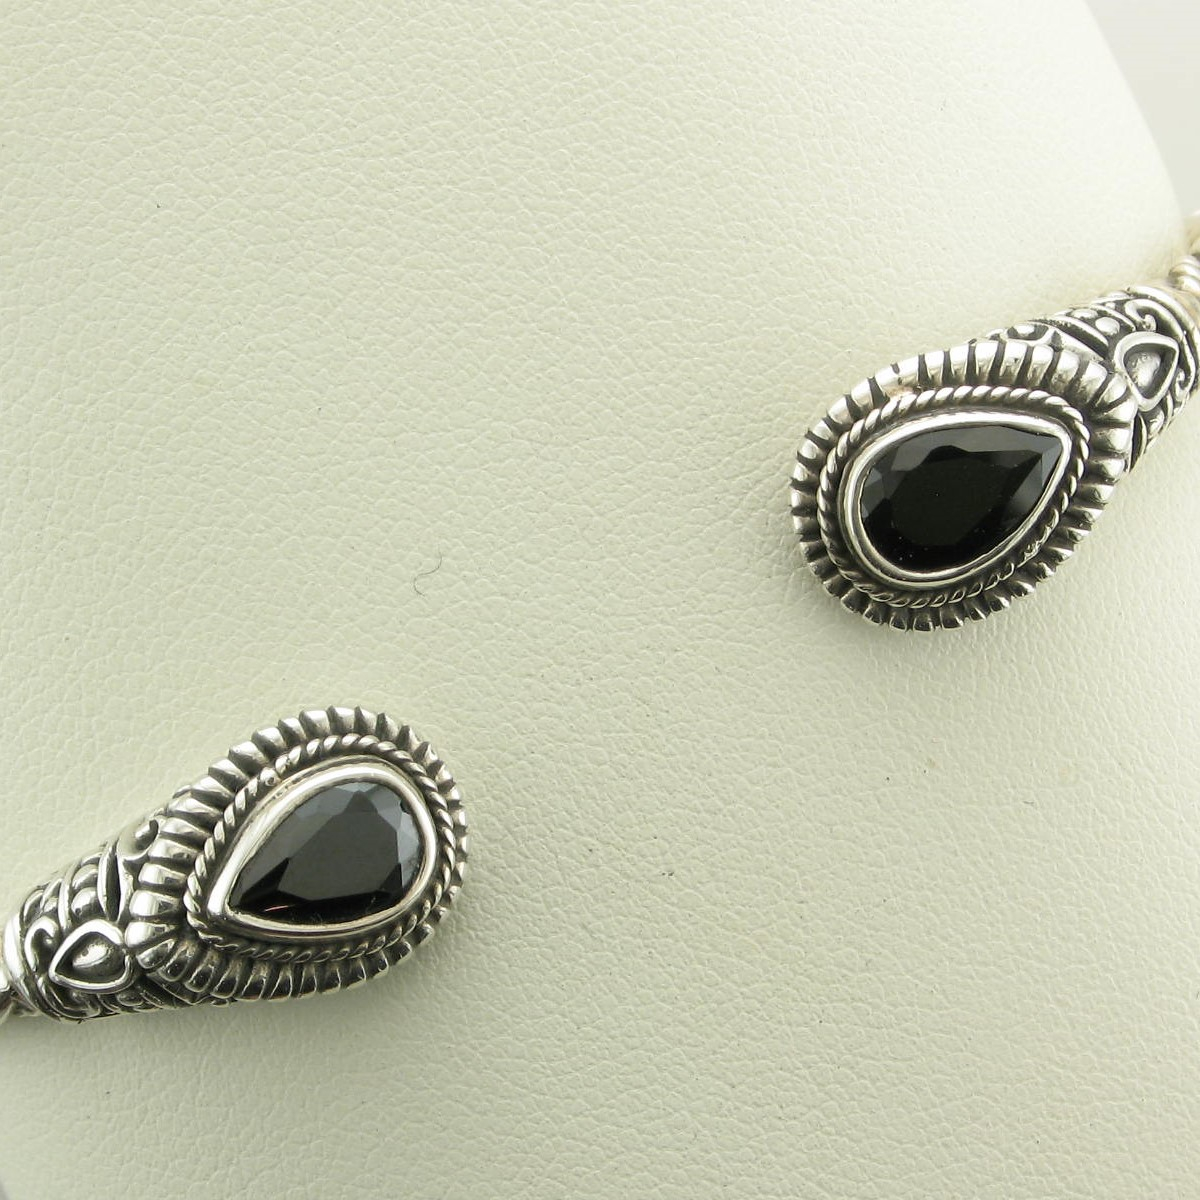 Sterling Silver Bali Style Black Onyx Hinged Cuff Bracelet